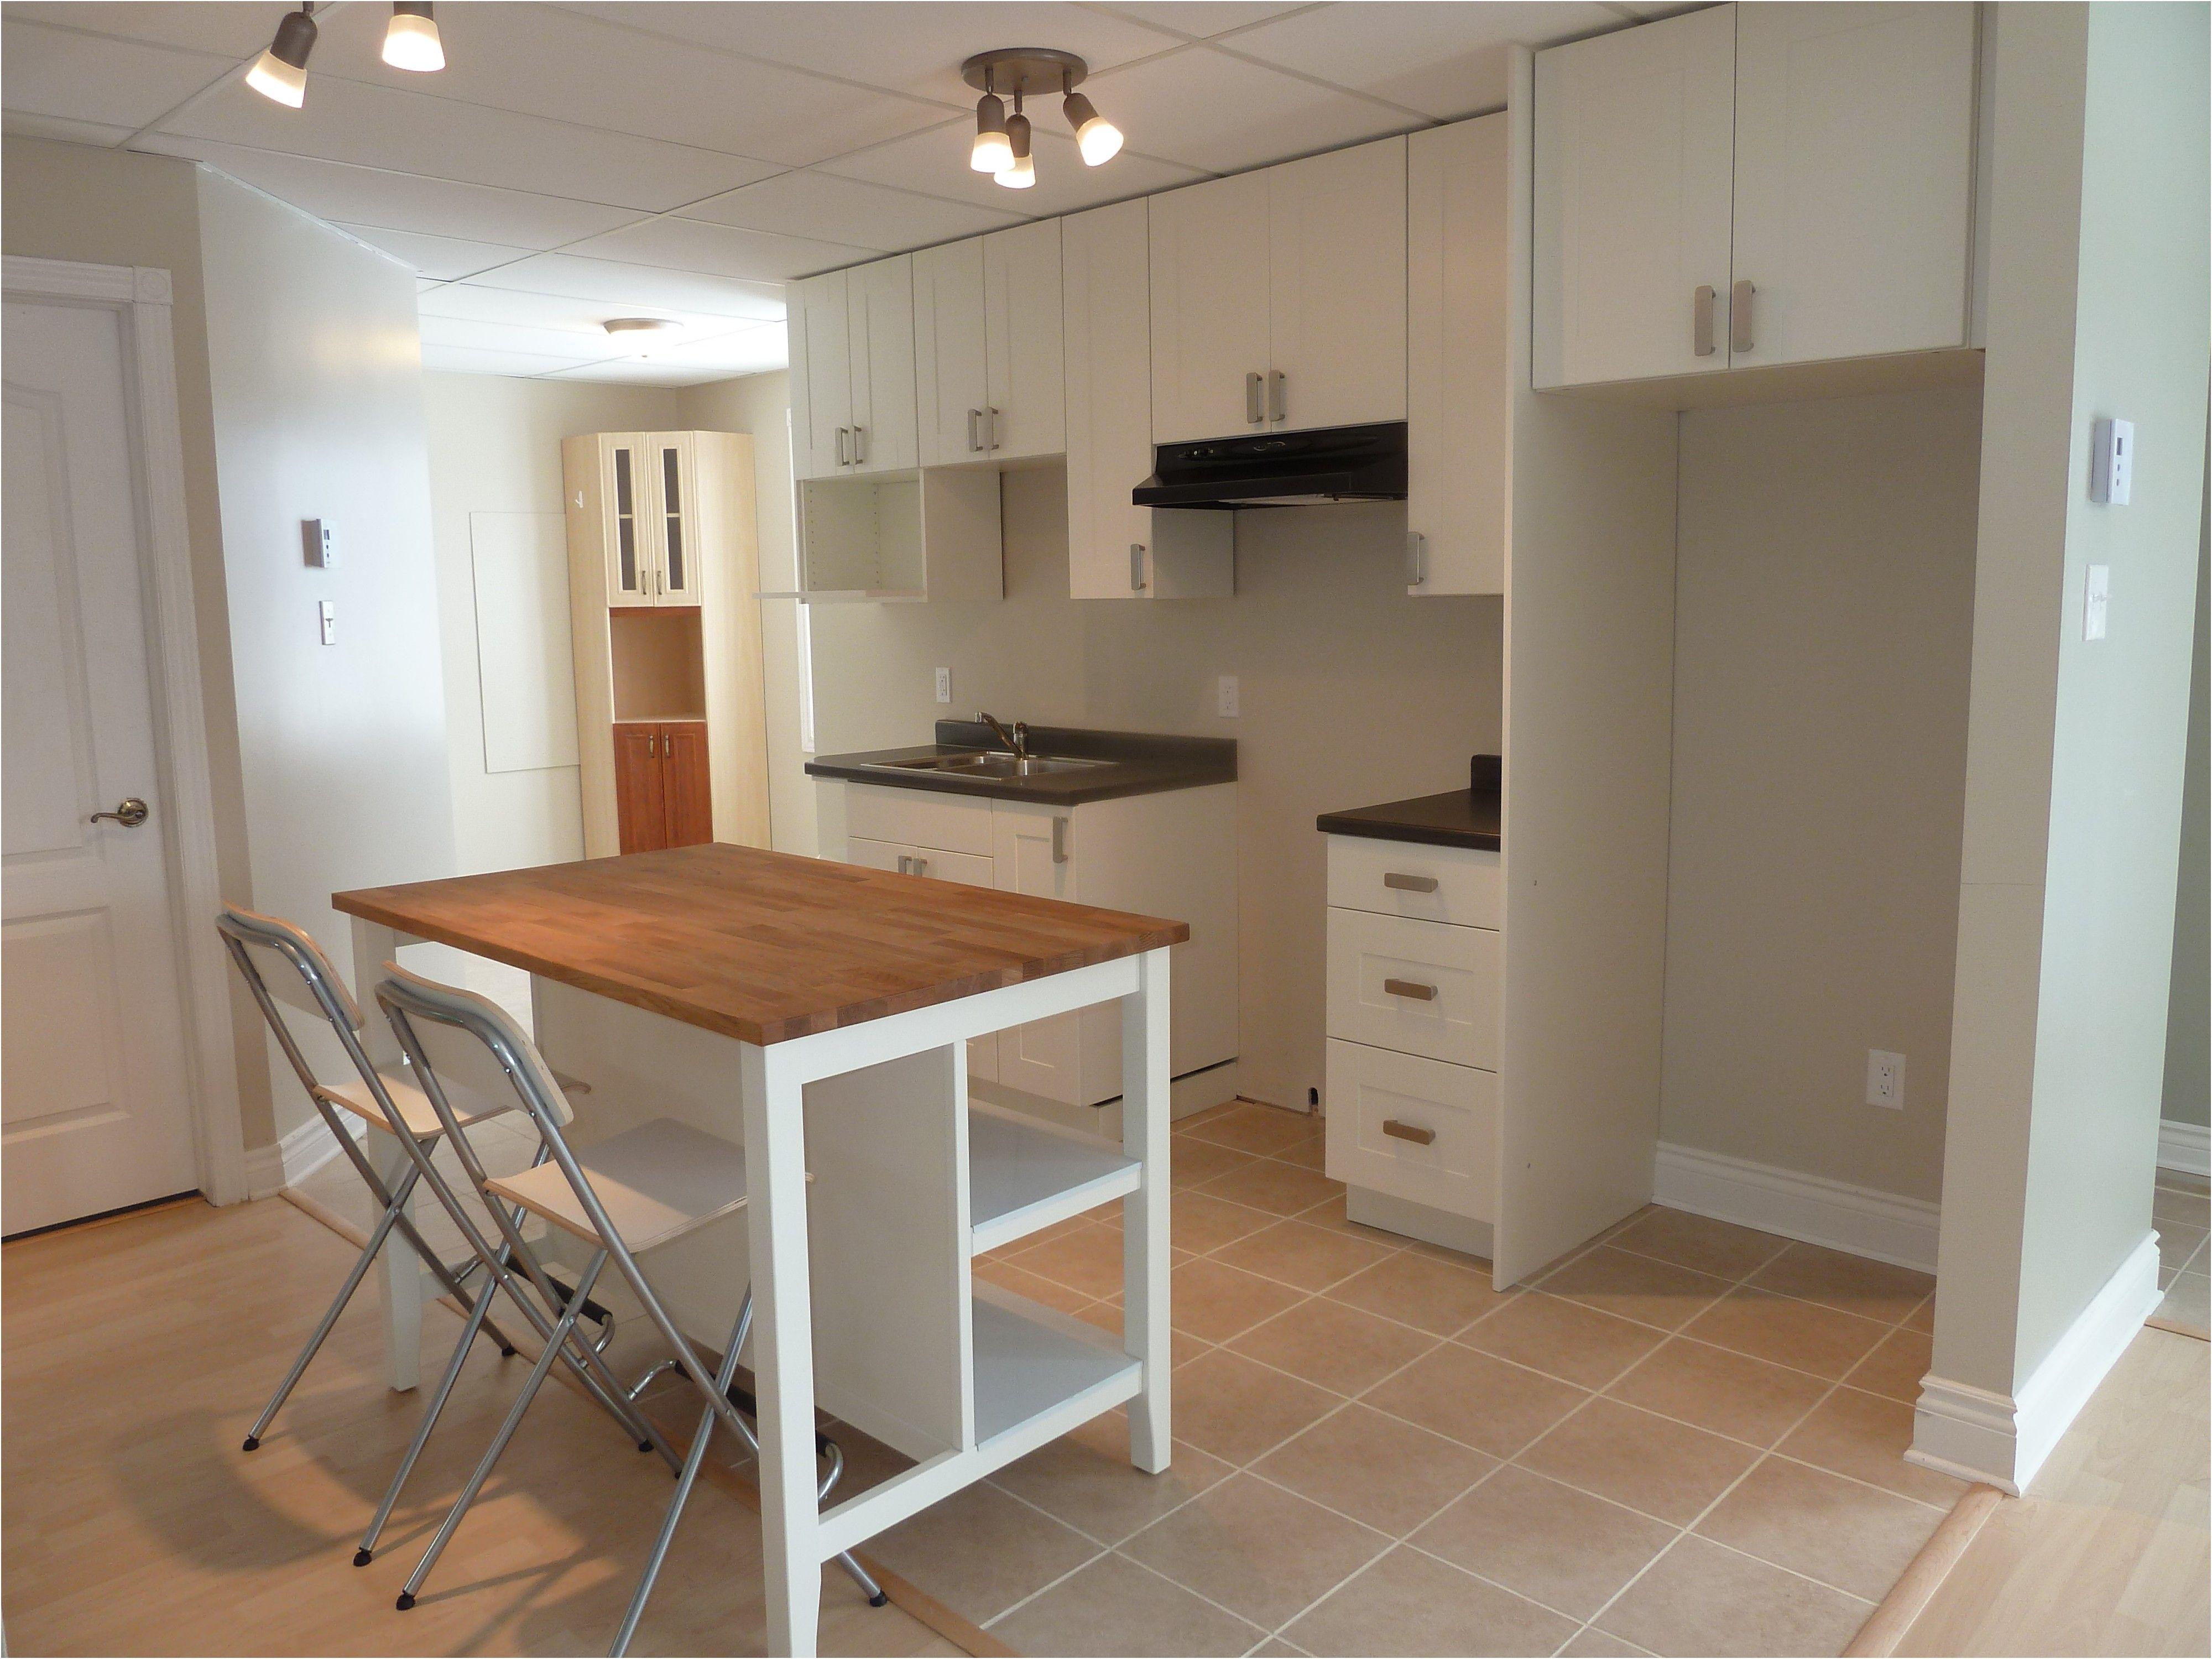 Studio Basement Apartment 2 Apartment 2 Bedroom Floor Plans2 From Basement  Apartments For Rent In Hamilton